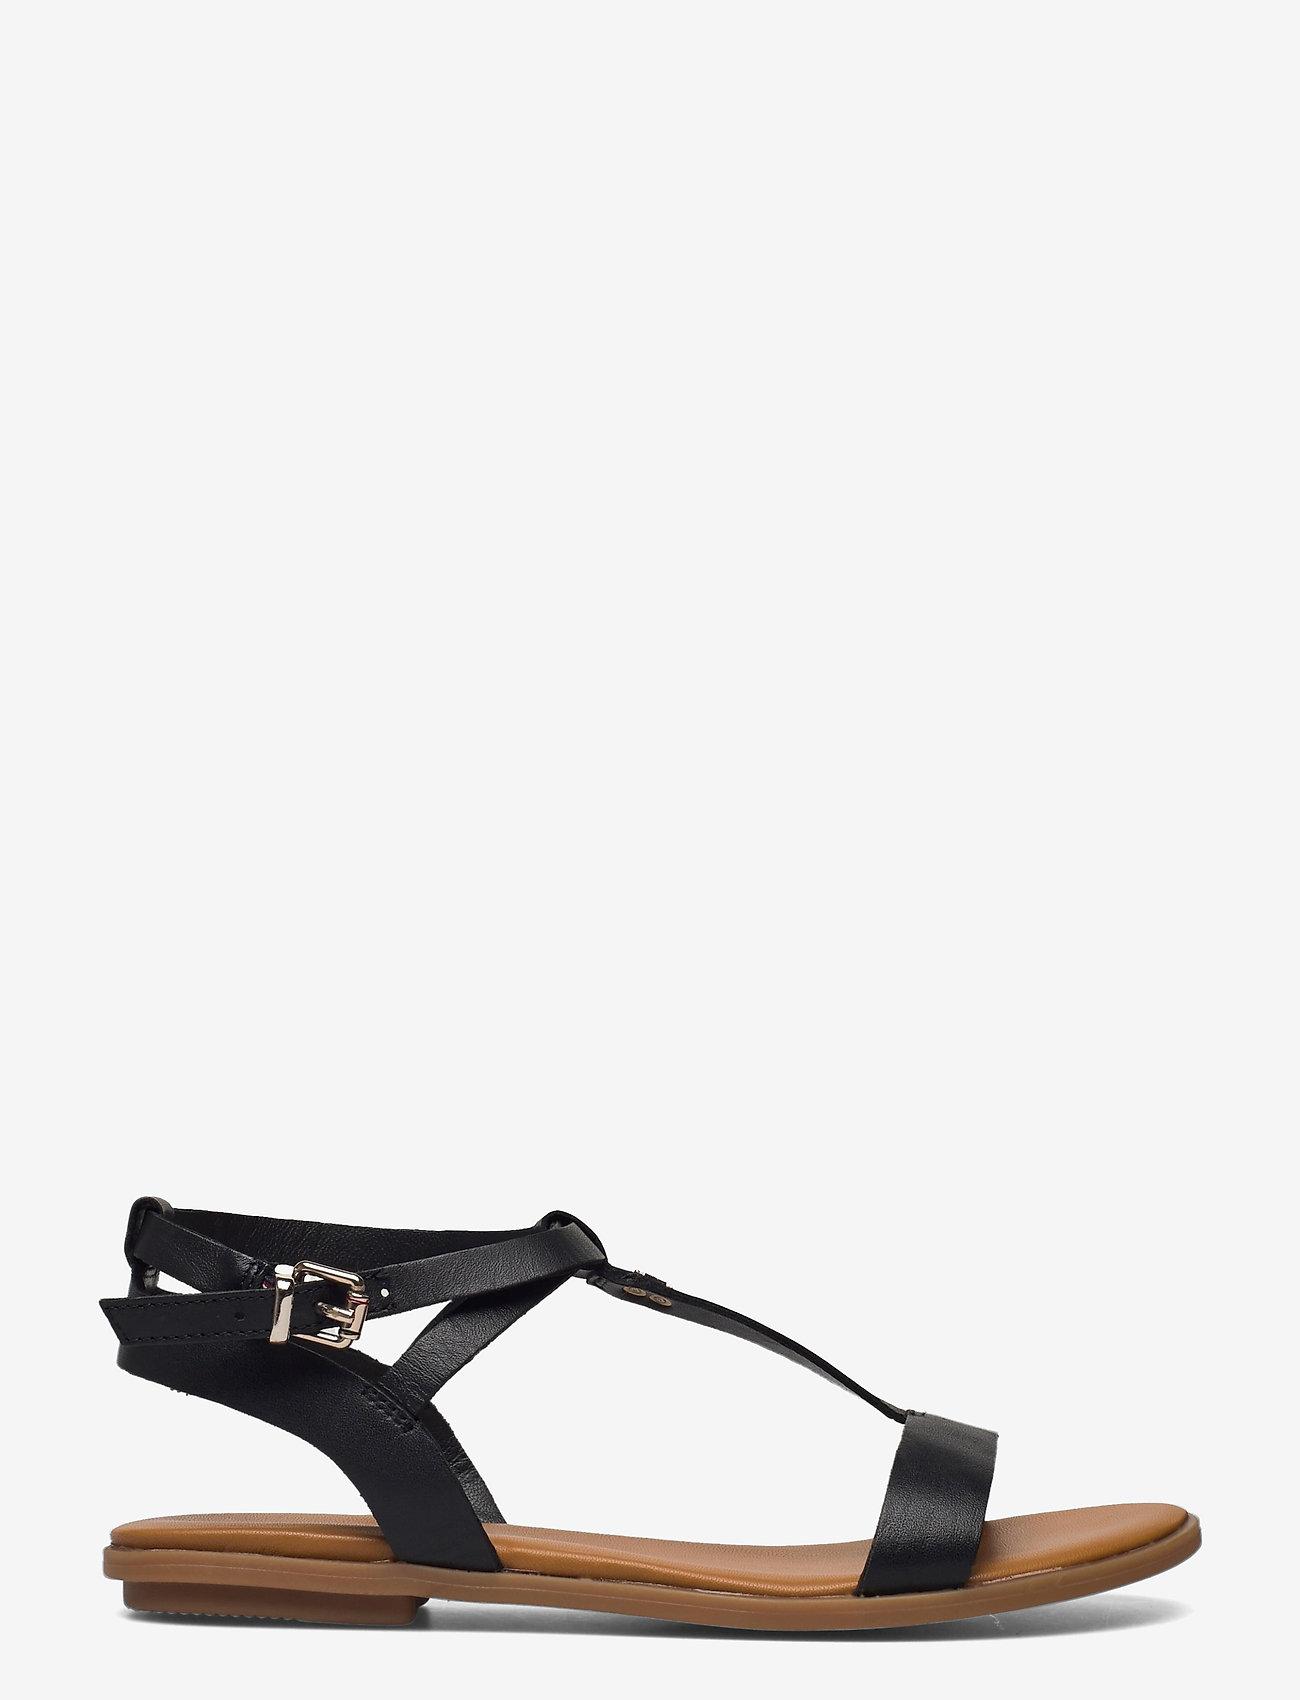 Tommy Hilfiger - FEMININE LEATHER FLAT SANDAL - flat sandals - black - 1